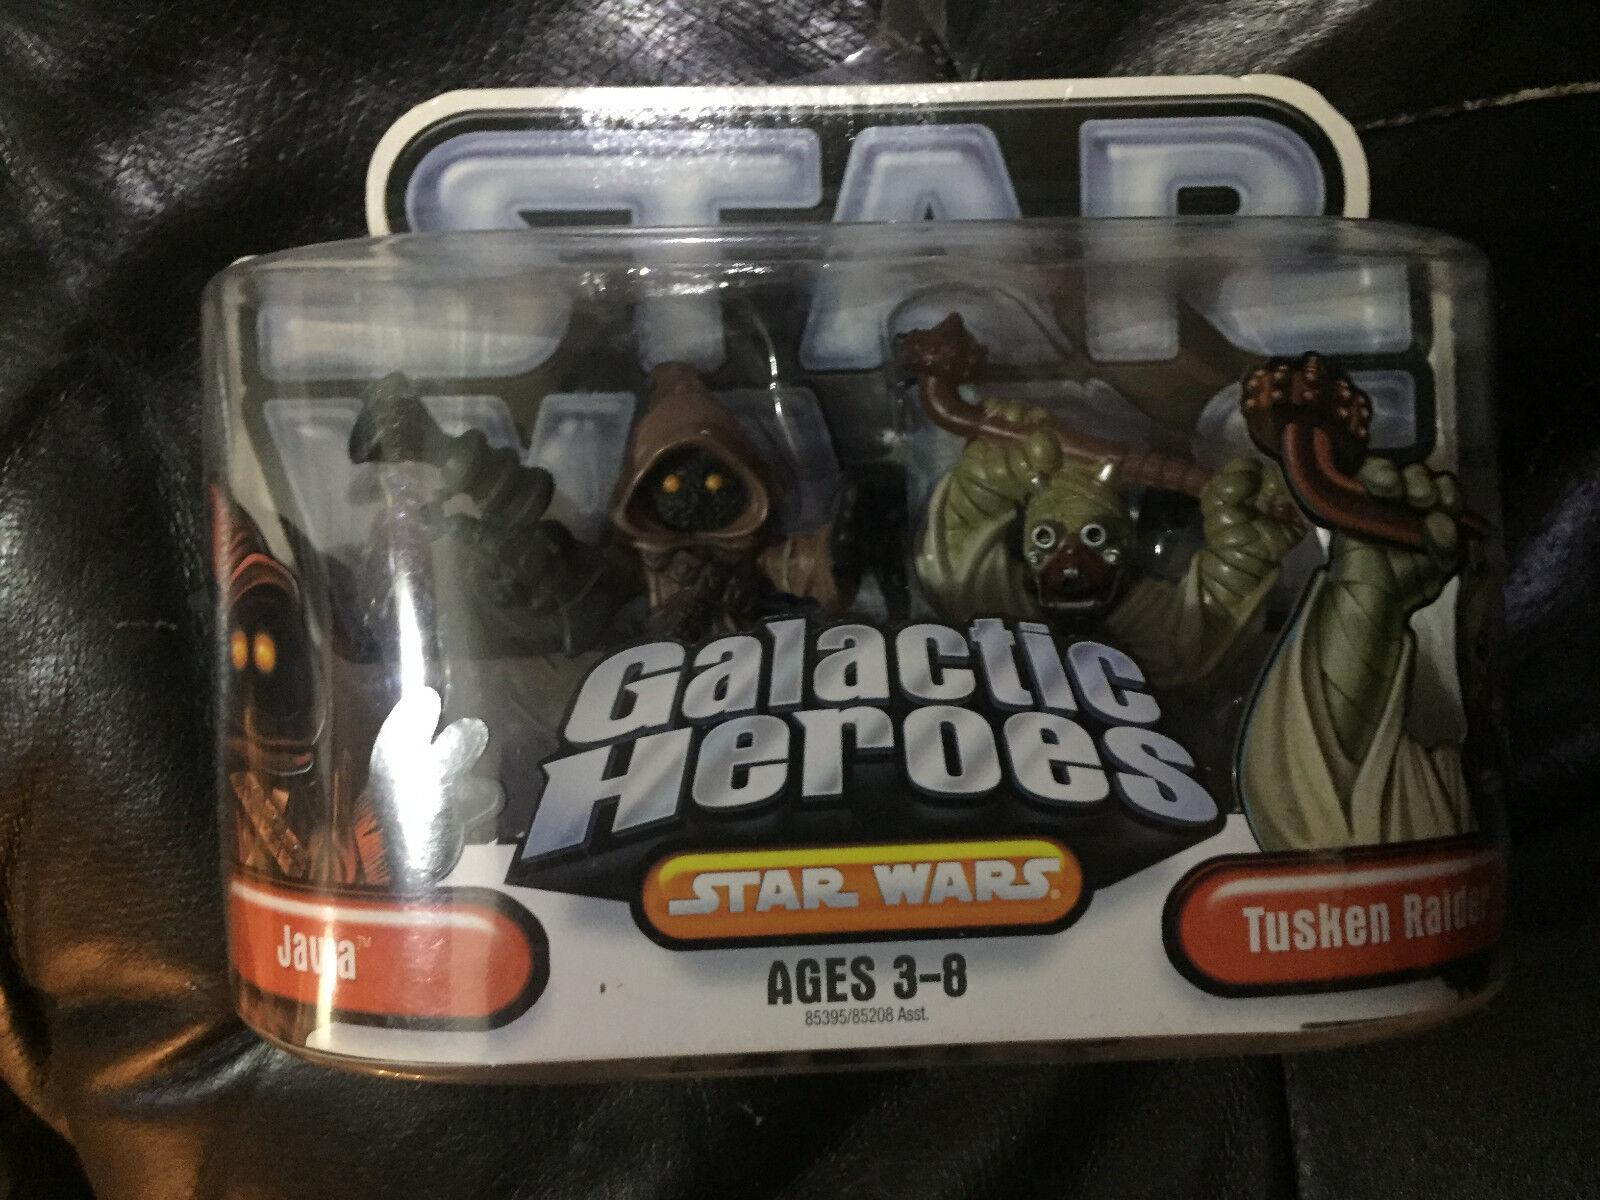 Estrella Wars Galactic Heroes Mini-figura 2 Pack-Jawa & Tusken Raider Nuevo MOC difícil de encontrar